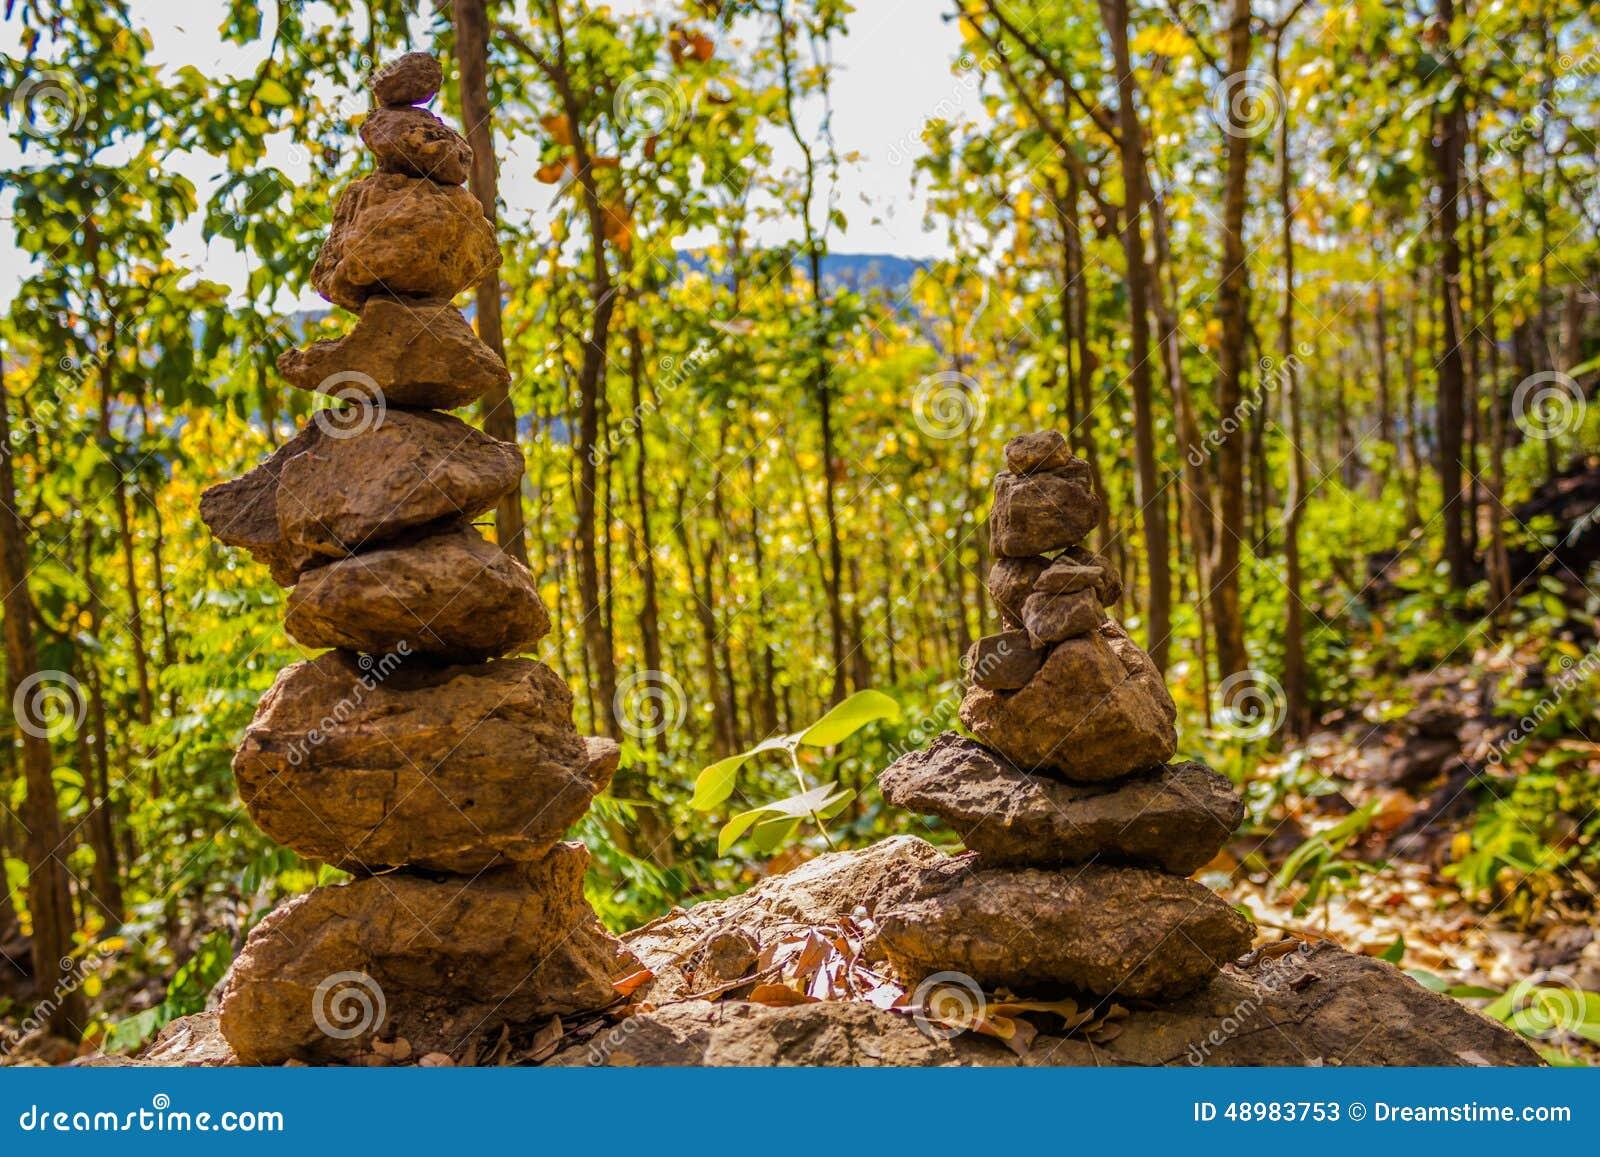 Zwei Steinkontrolltürme